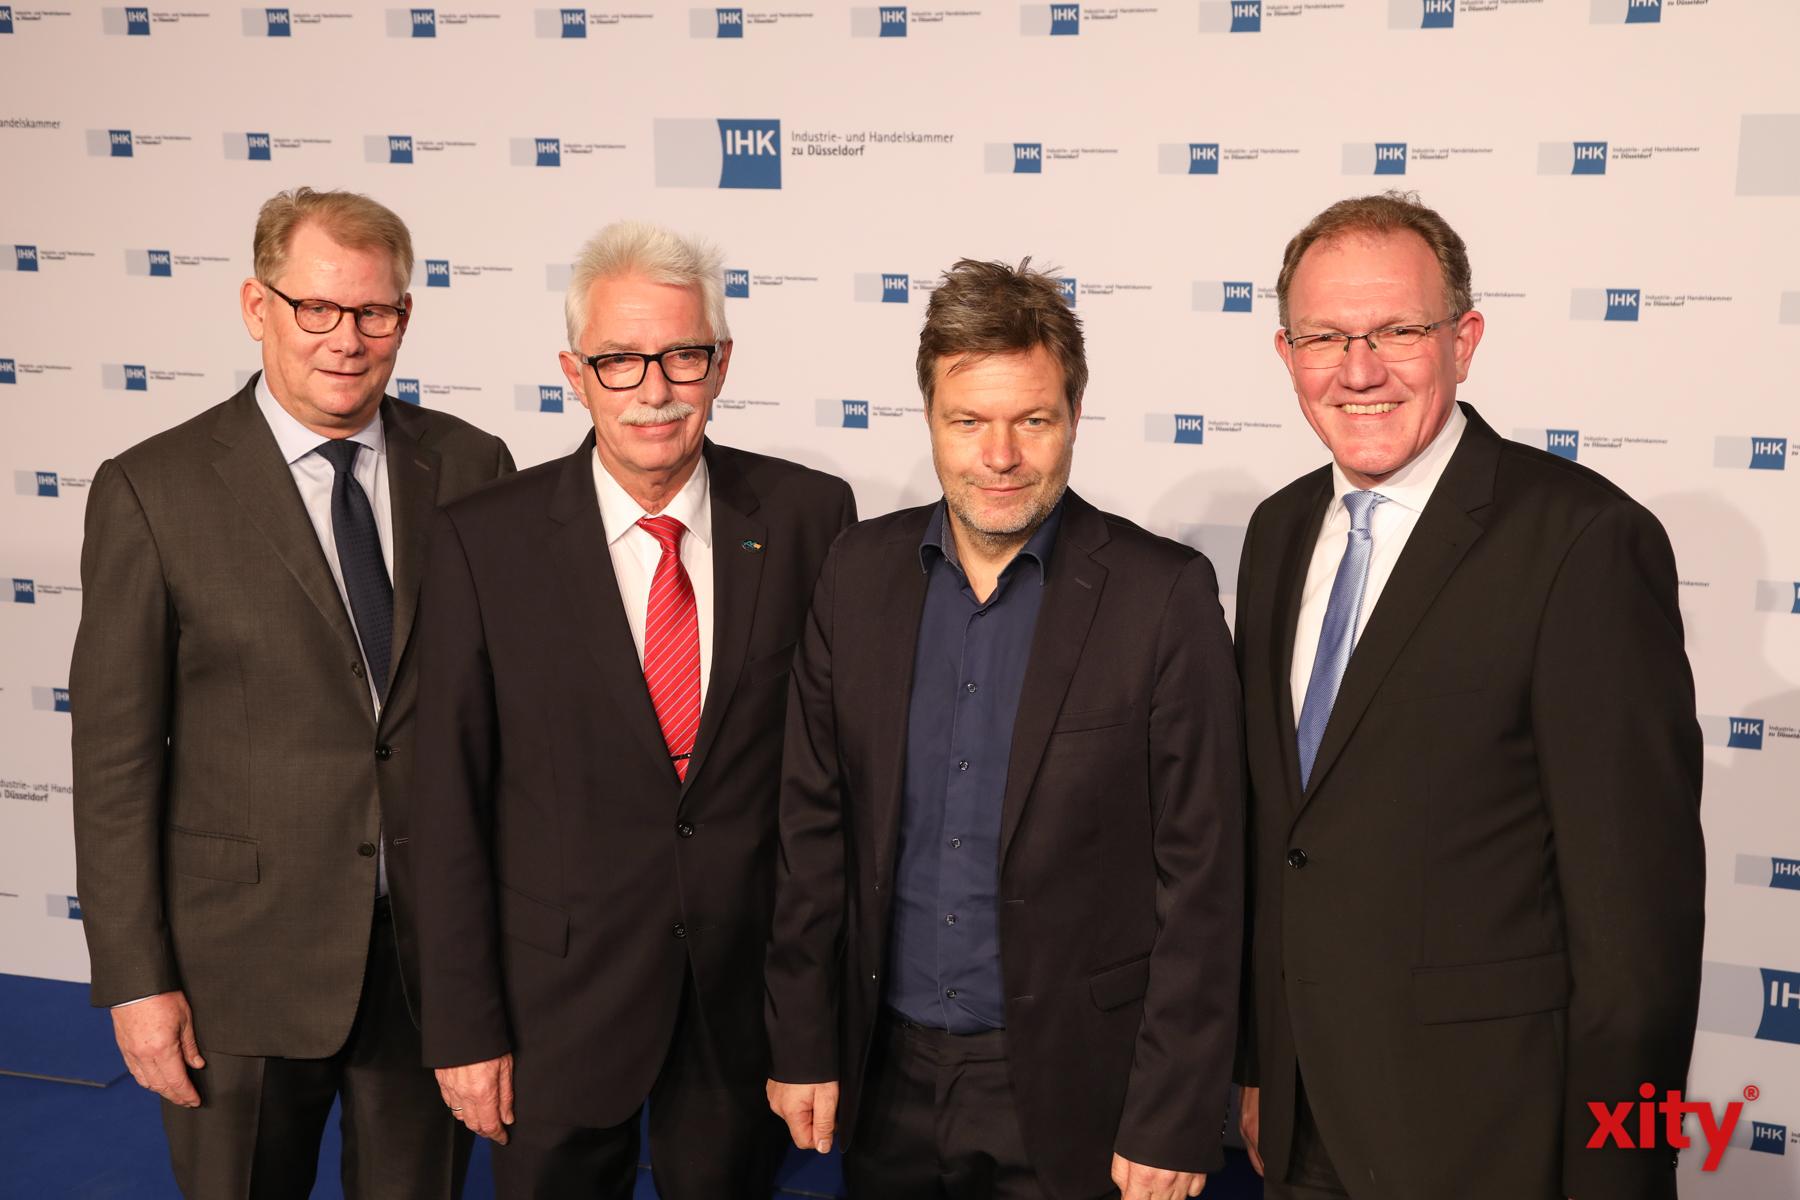 Andreas Schmitz, Thomas Hendele, Robert Habeck und Gregor Berghausen (Foto: xity)